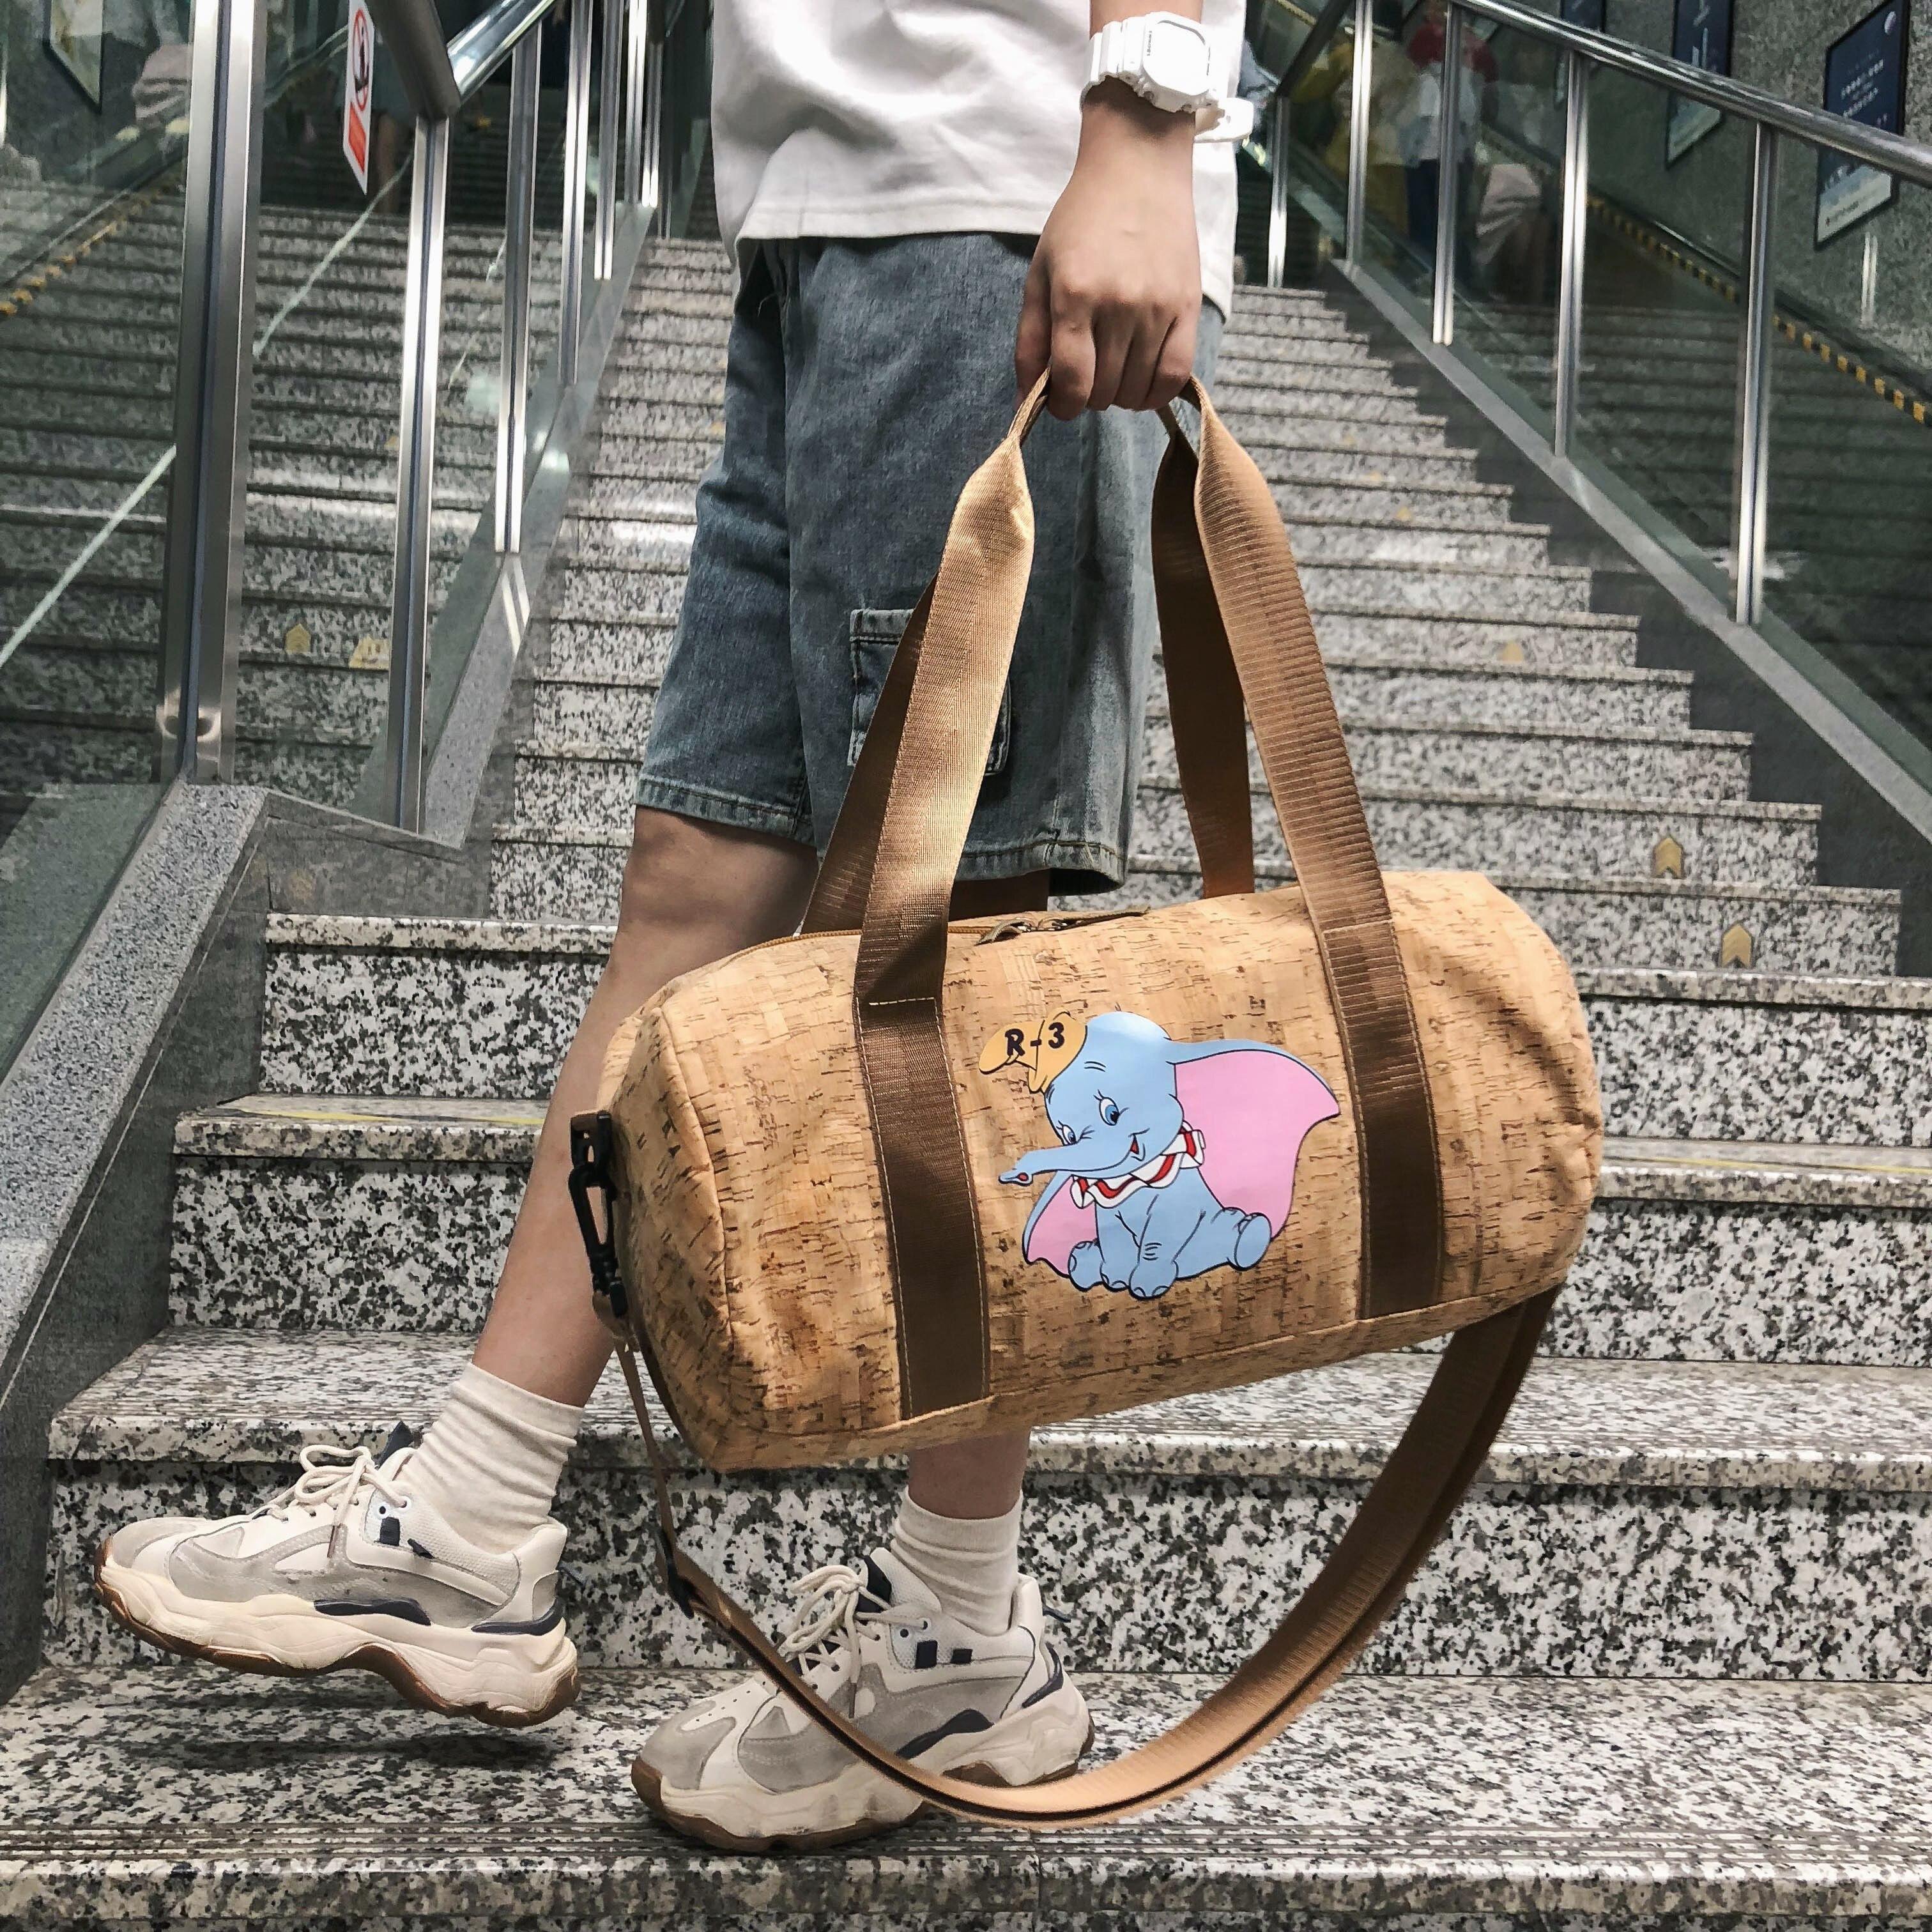 Women Travel Bags Cartoon 2019 New Fashion Large Capacity Waterproof Print Luggage Duffle Bag Men Casual Travel Bags Elephant in Travel Bags from Luggage Bags